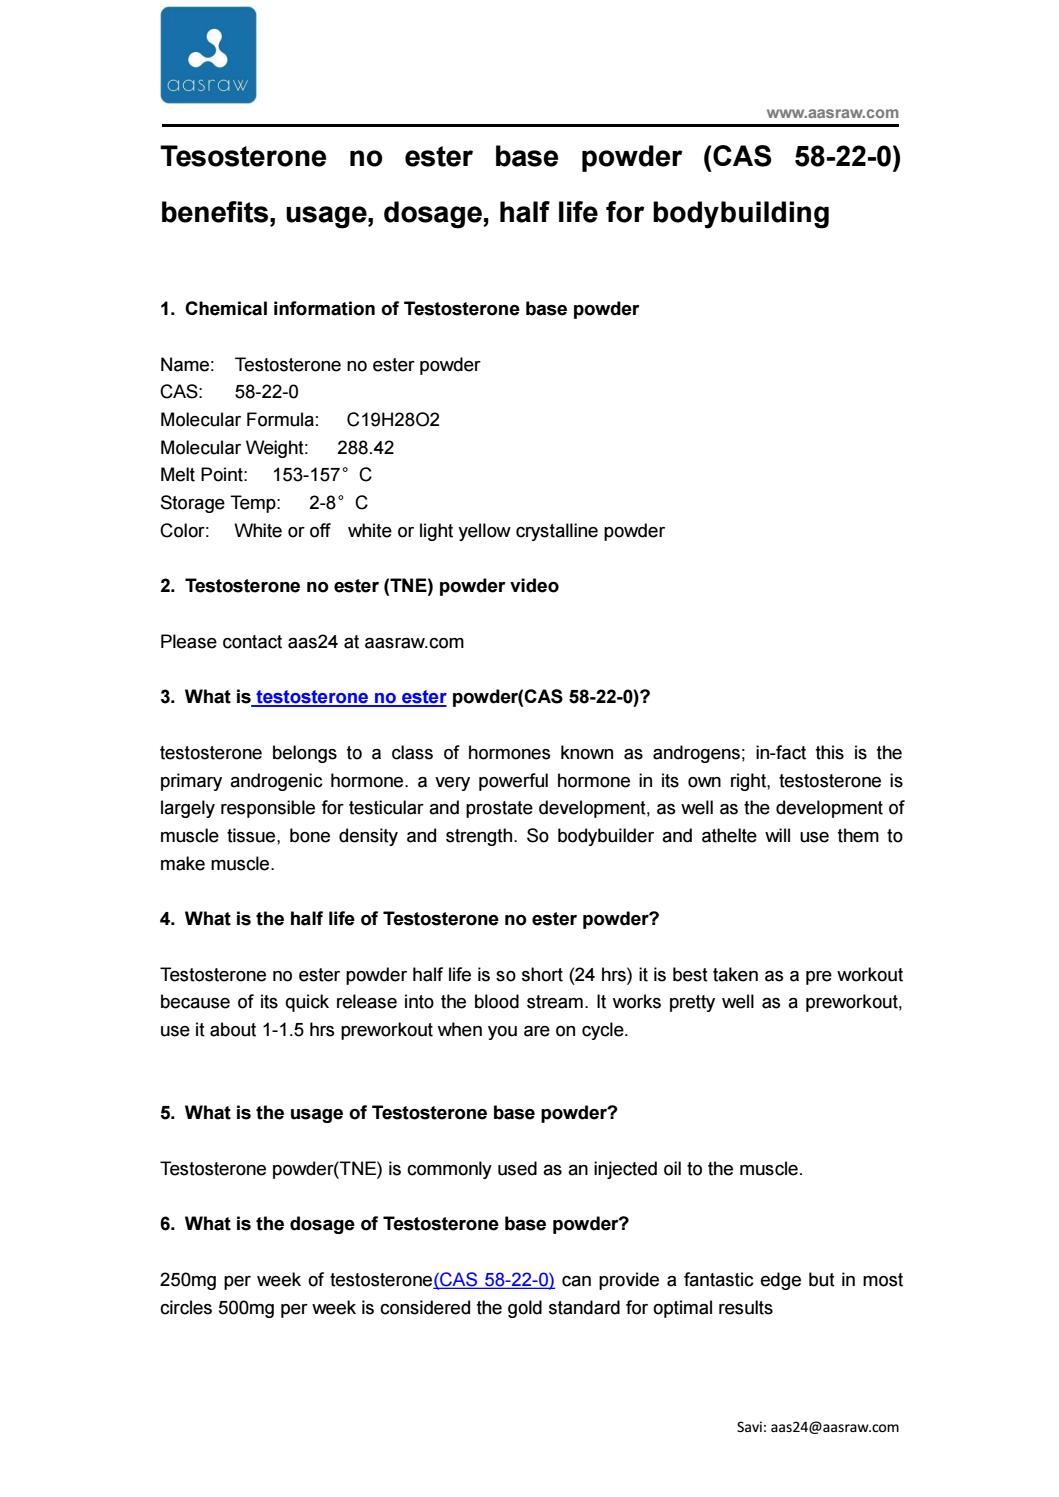 Tesosterone no ester base powder (CAS 58-22-0) benefits